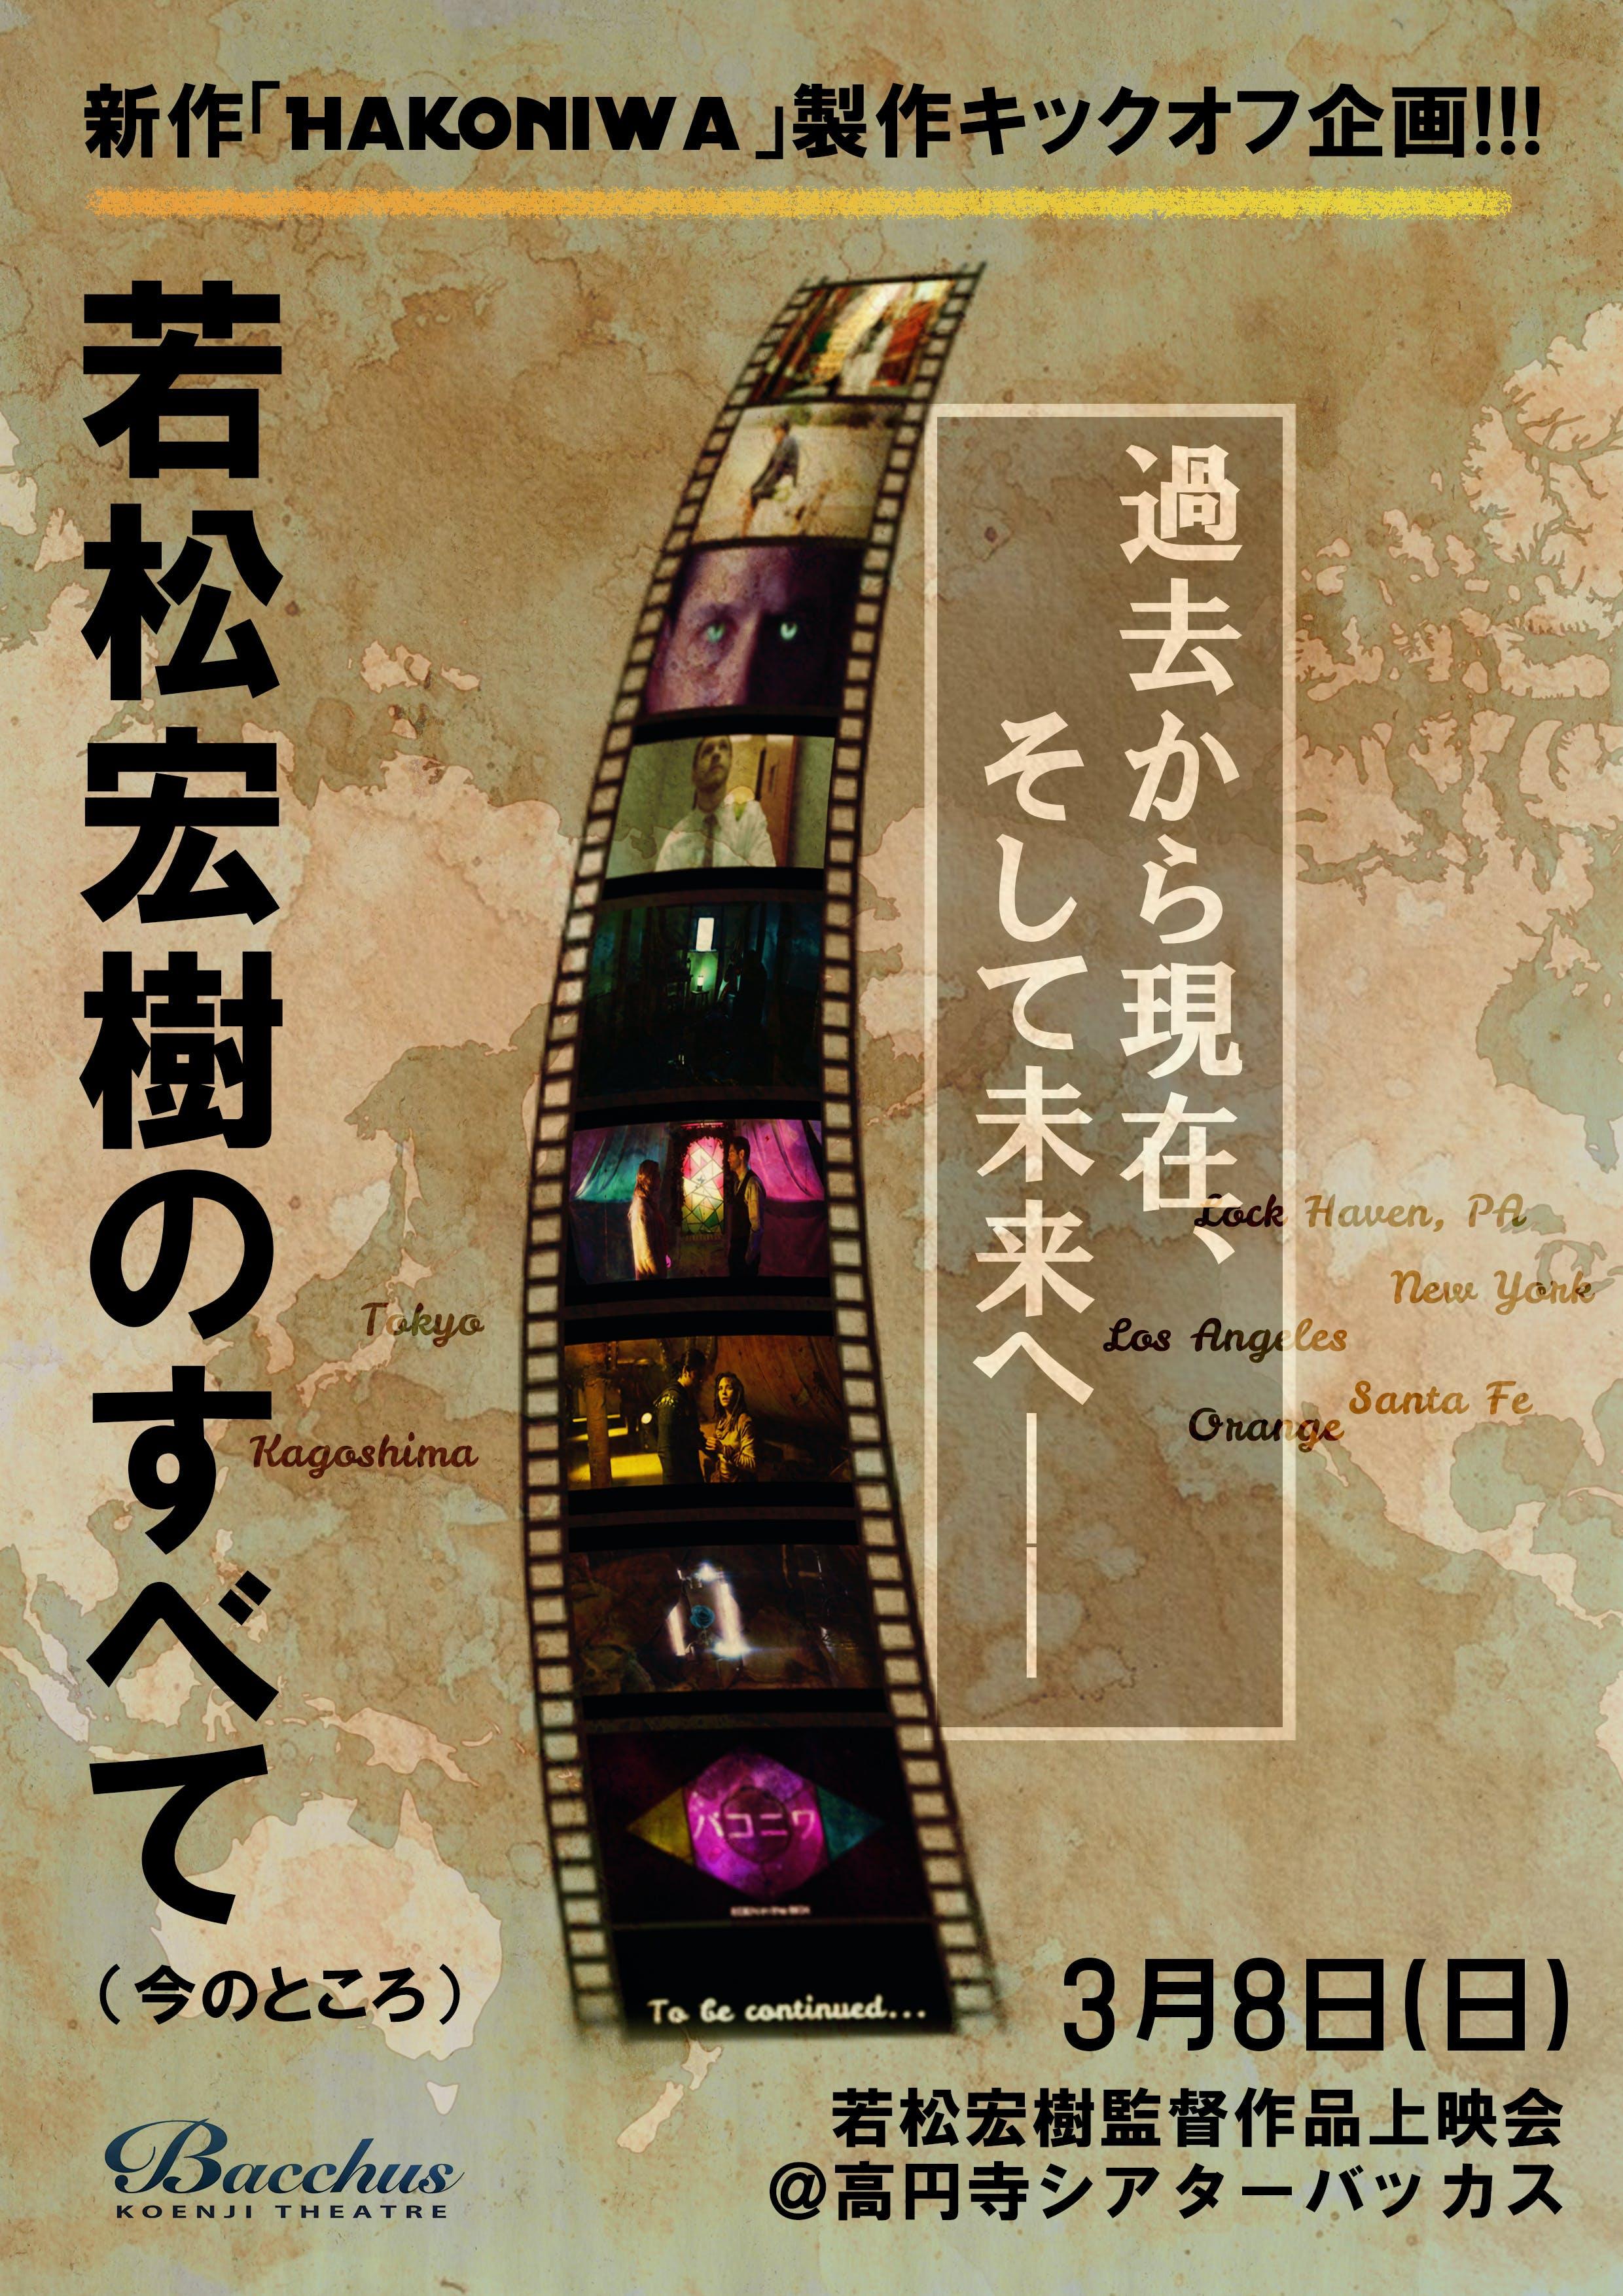 HAKONIWA」製作キックオフ企画第一弾!高円寺シアターバッカスさんで3 ...